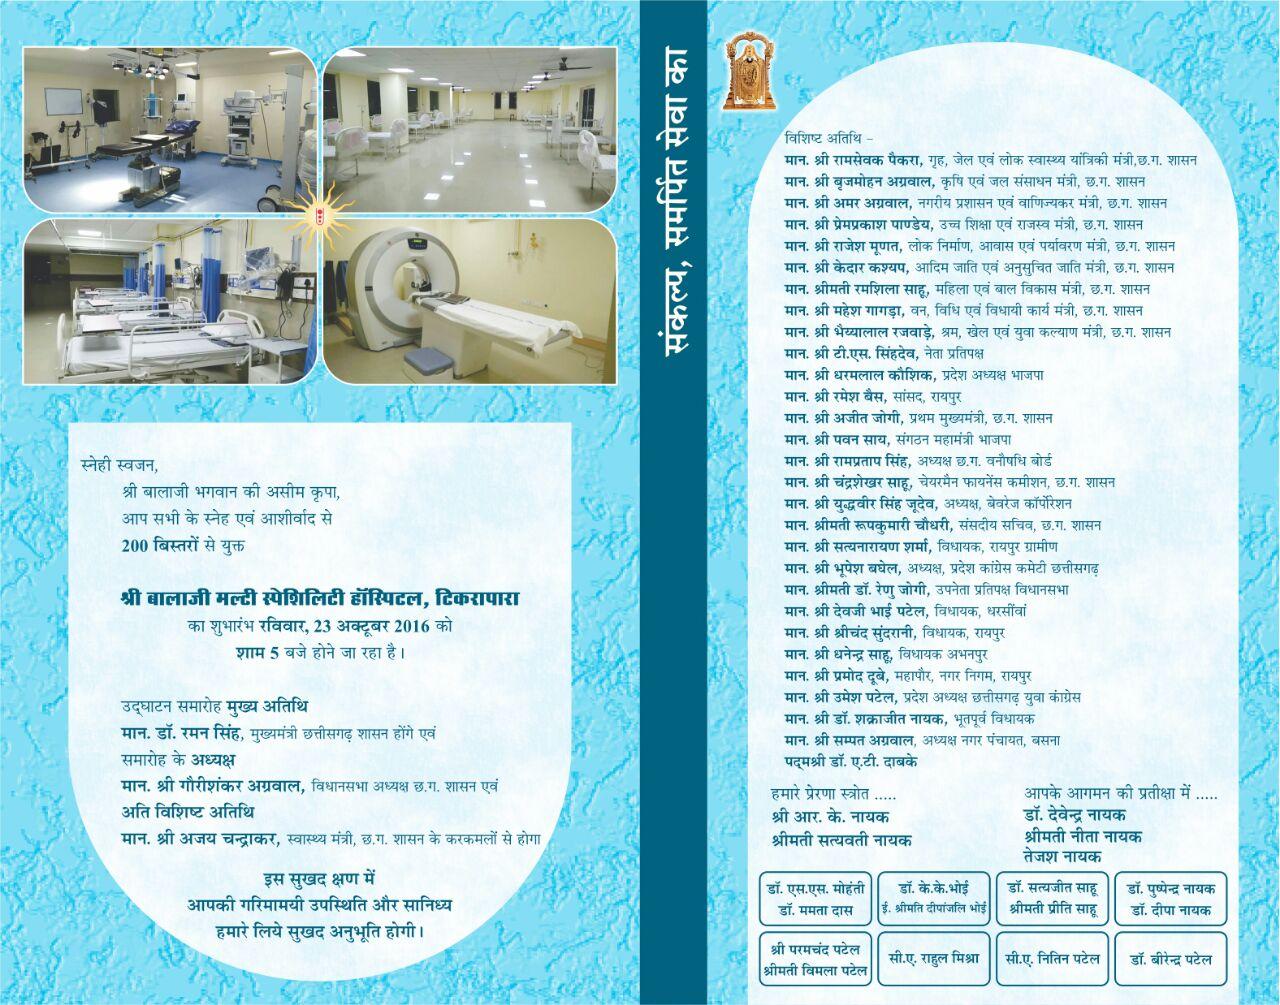 Shri Balaji Super Speciality Hospital Raipur